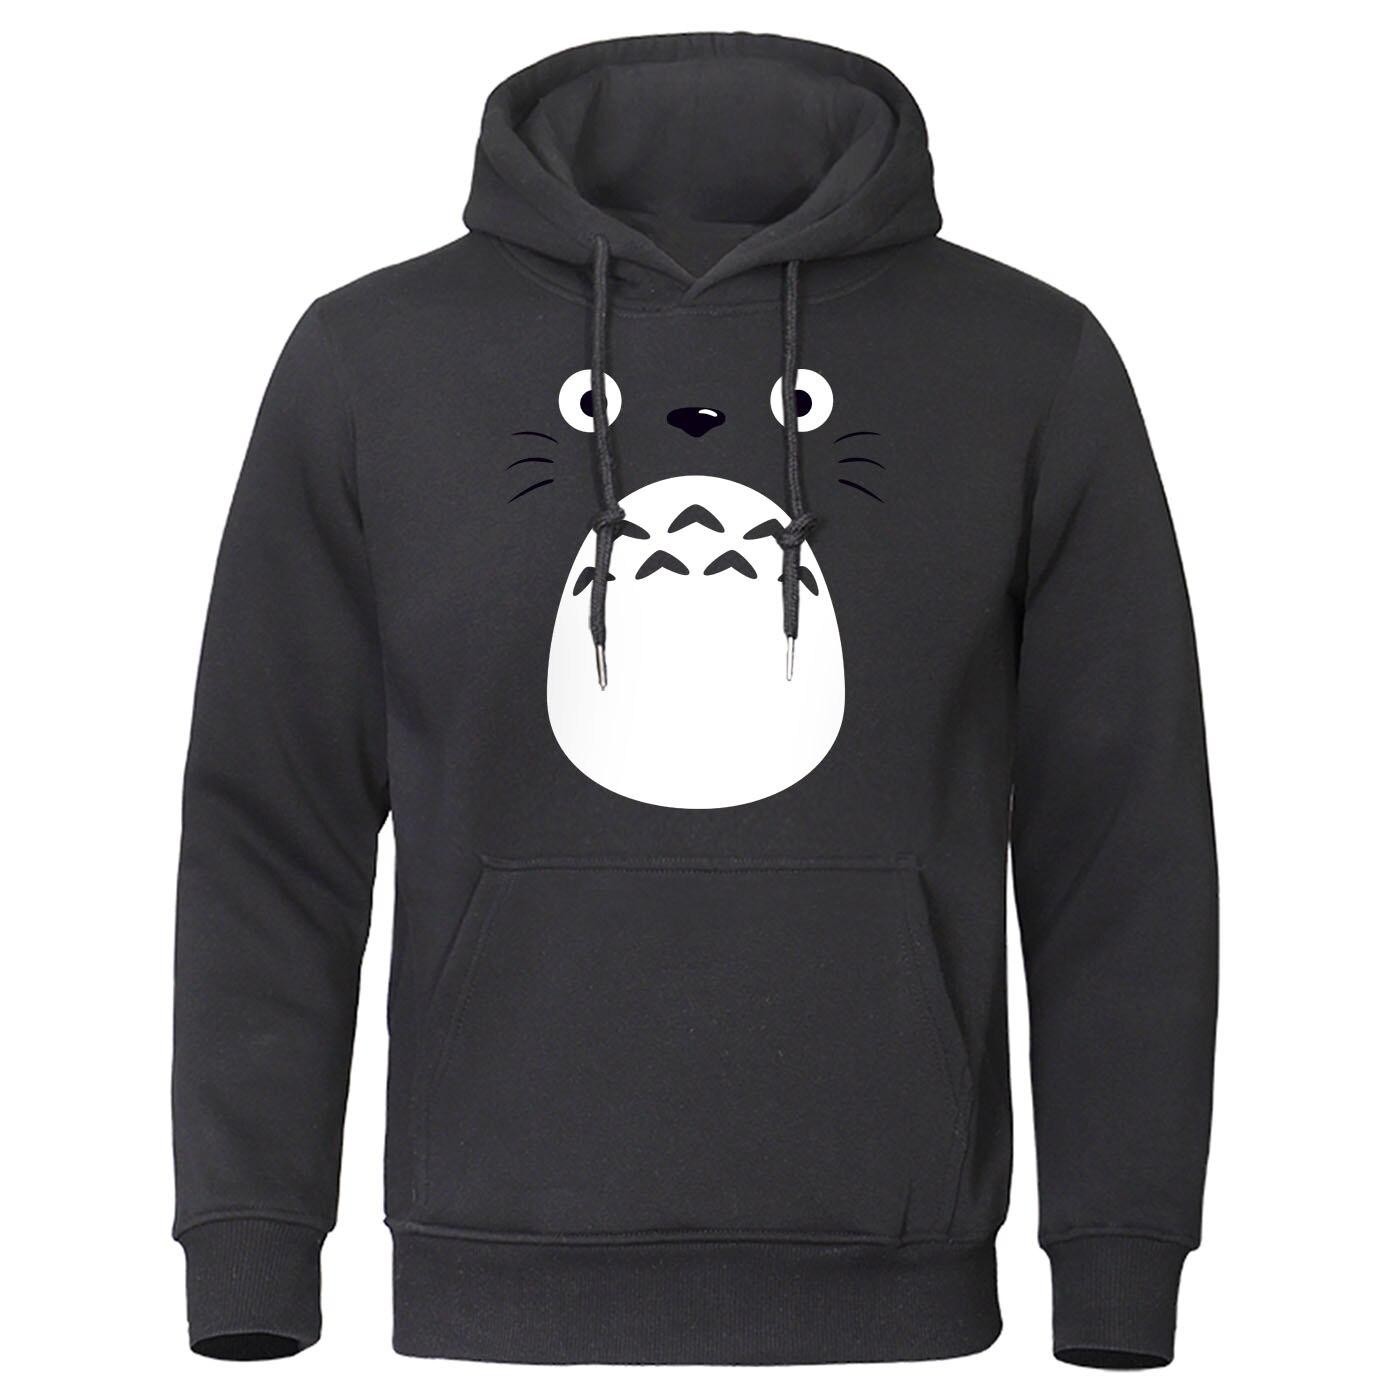 Spirited Away Totoro Men Hoodies Miyazaki Hayao Cartoon Clothes Japan Anime Pullover Studio Ghibli Hooded Sweatshirt Streetwear